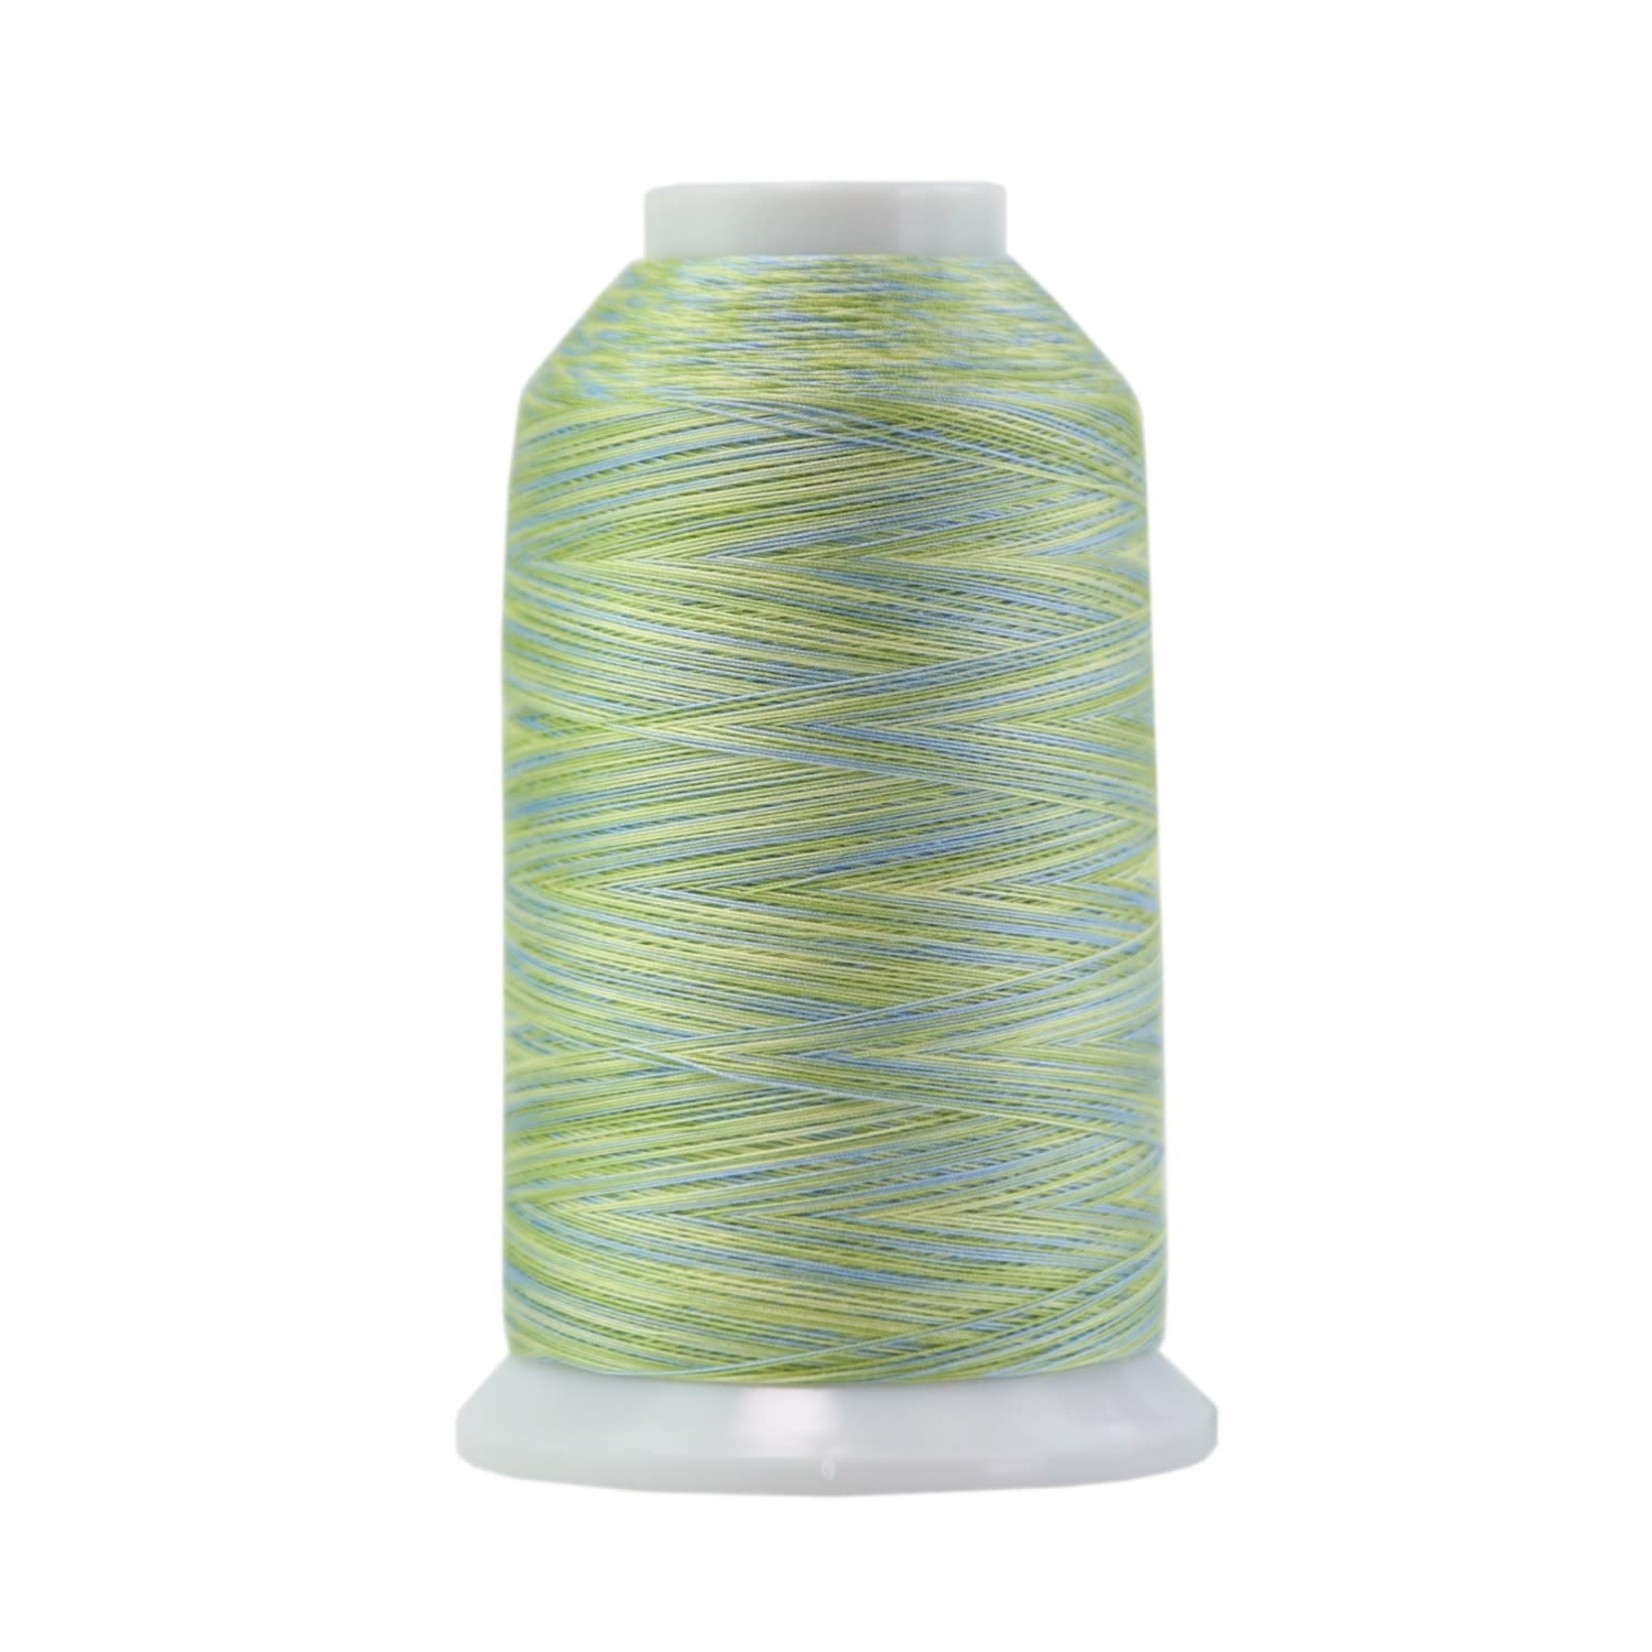 Superior Threads King Tut - #40 - 1828 m - 1045 Soft Sunrise